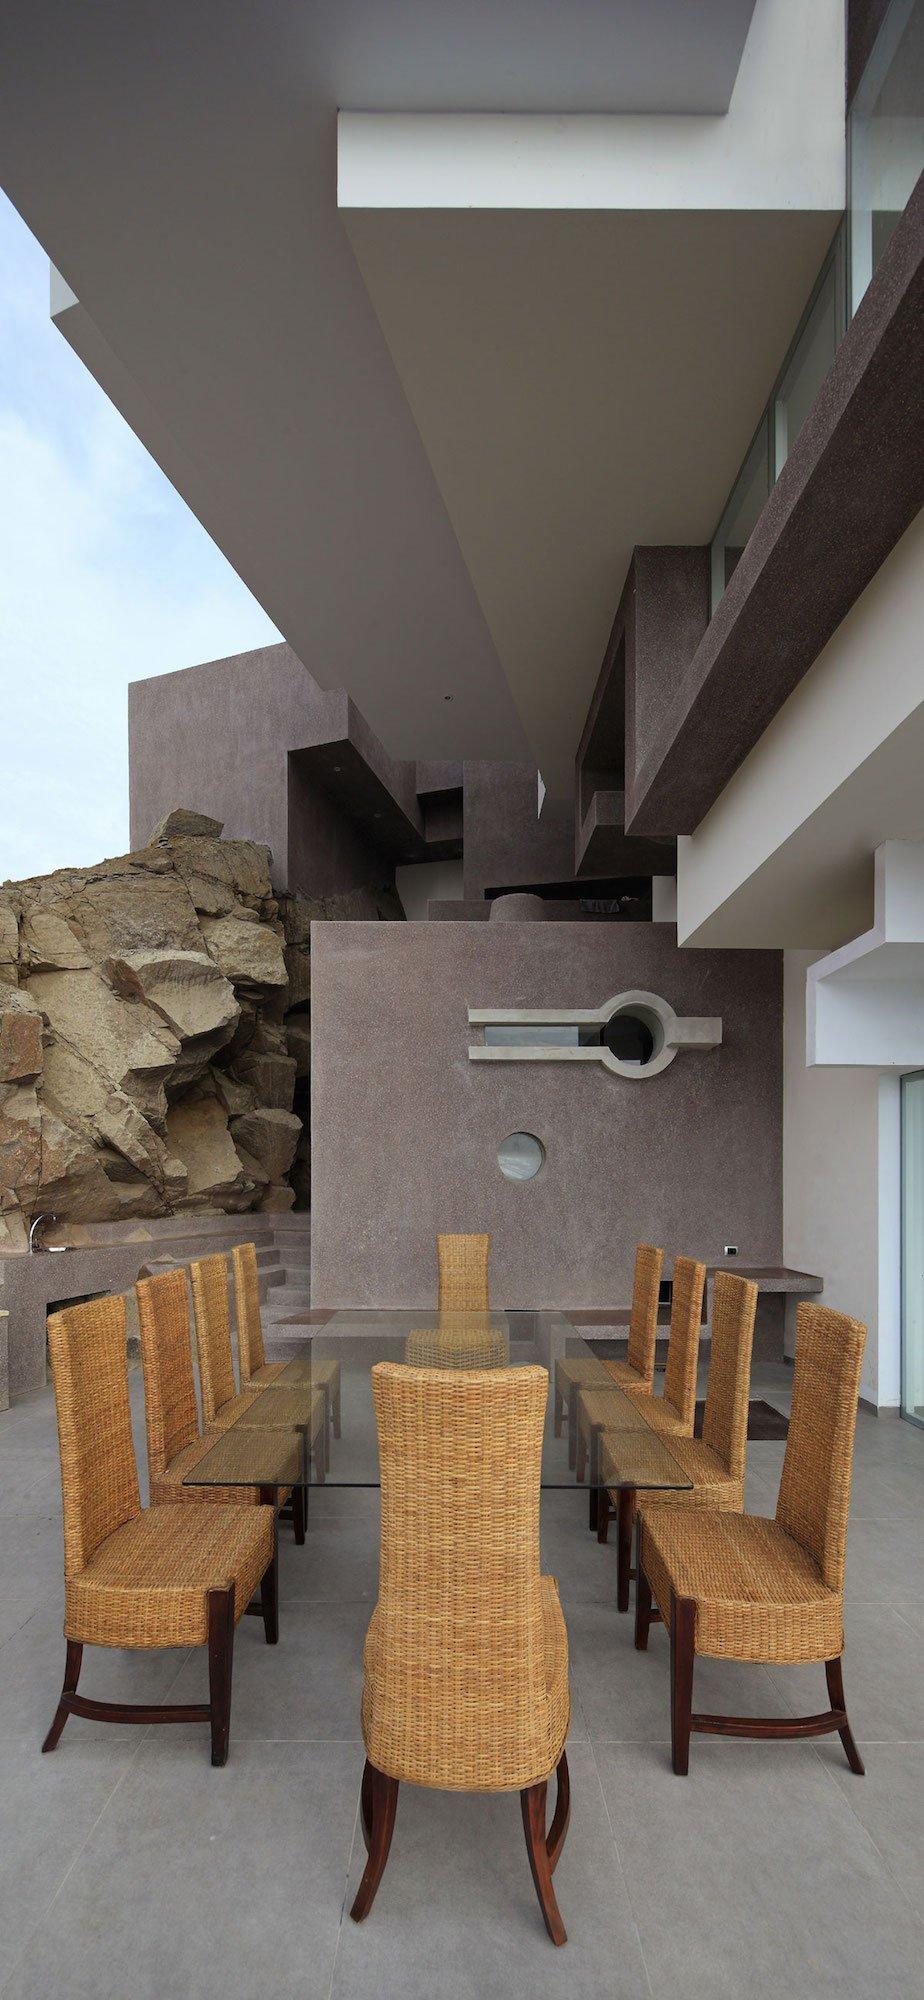 Veronica-Beach-House-05